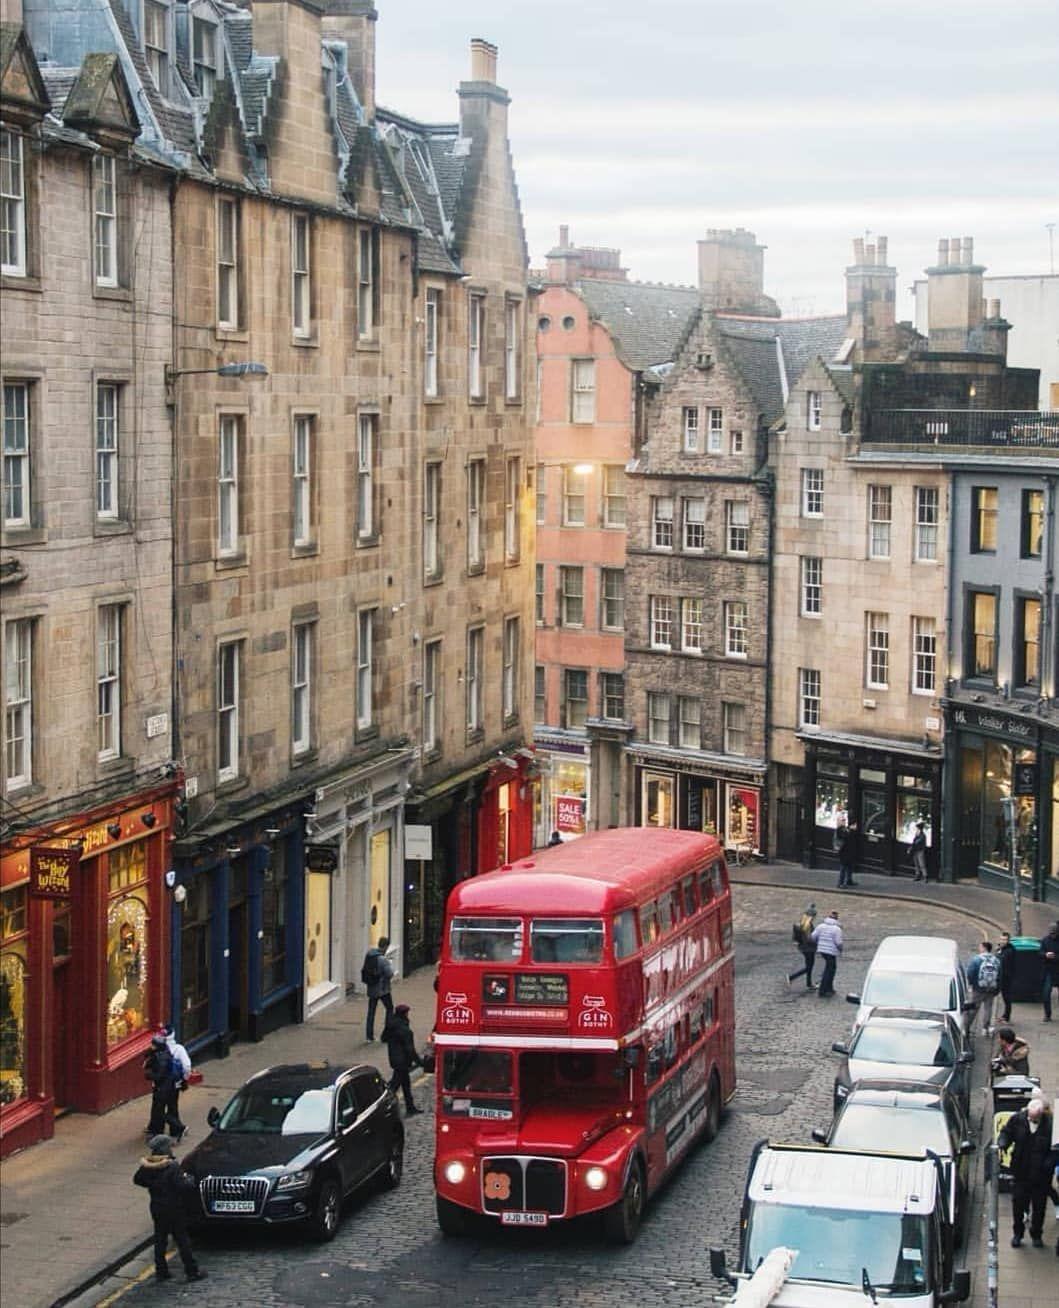 A busy and bustling West Bow, captured by @sarajvieira 😍 #ThisisEdinburgh #Edinphoto #Edinburgh